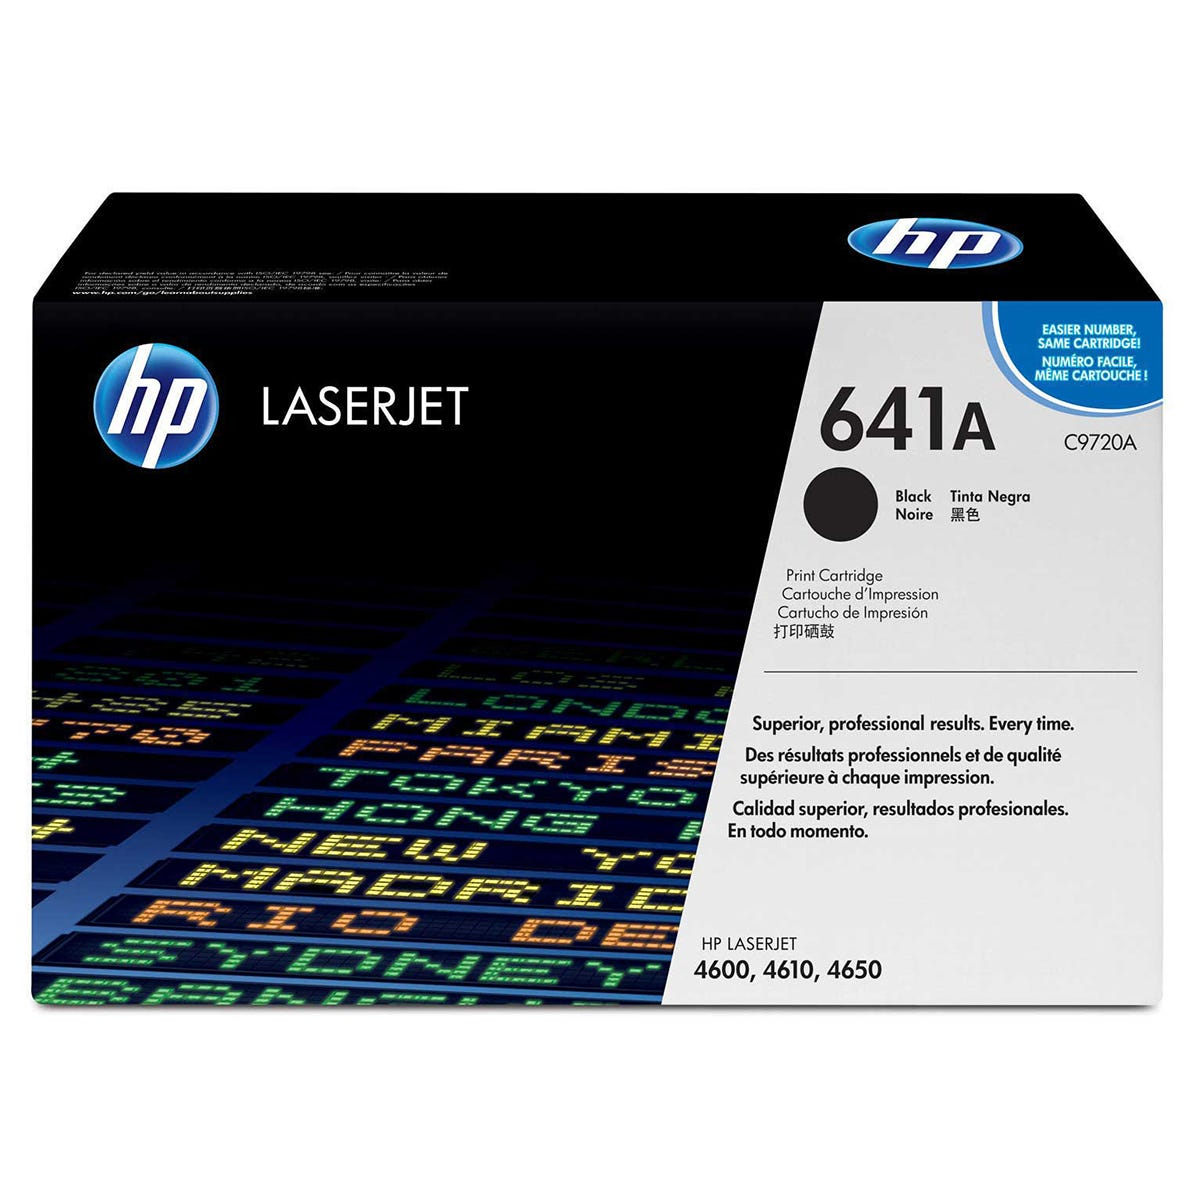 Image of HP 641A Printer Ink Toner Cartridge C9720A, Black web